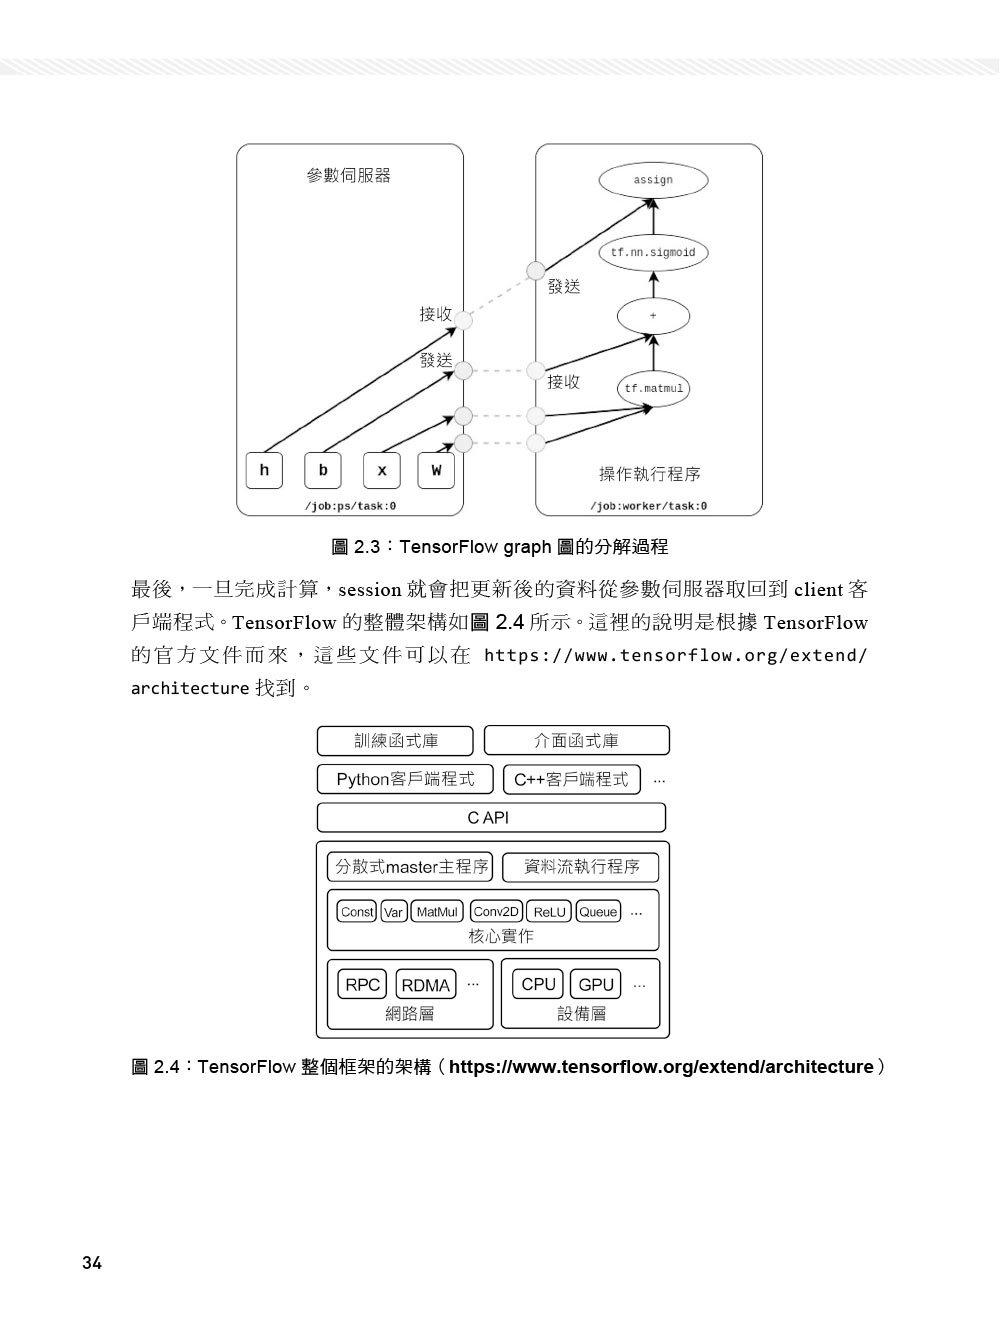 TensorFlow 自然語言處理|善用 Python 深度學習函式庫,教機器學會自然語言 (Natural Language Processing with TensorFlow)-preview-5